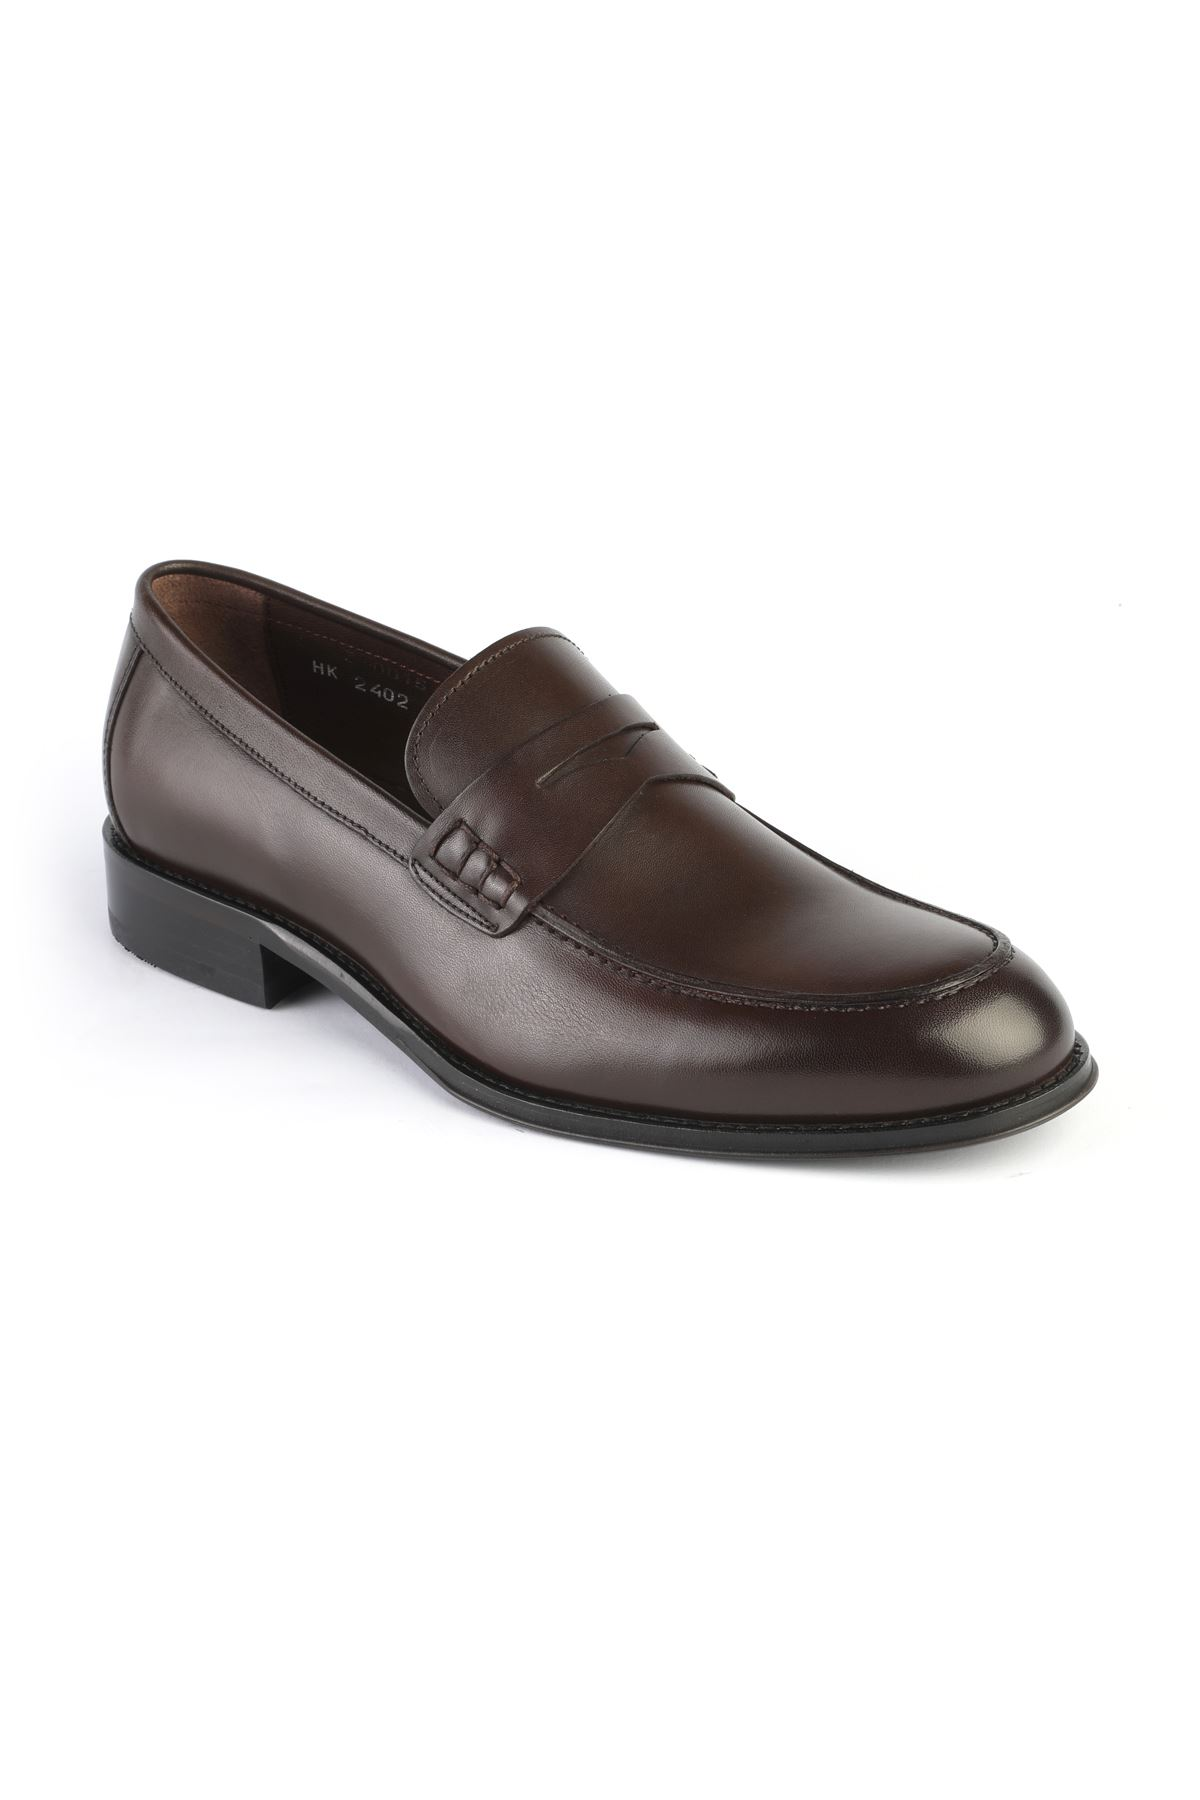 Libero 2402 Kahve Loafer Ayakkabı